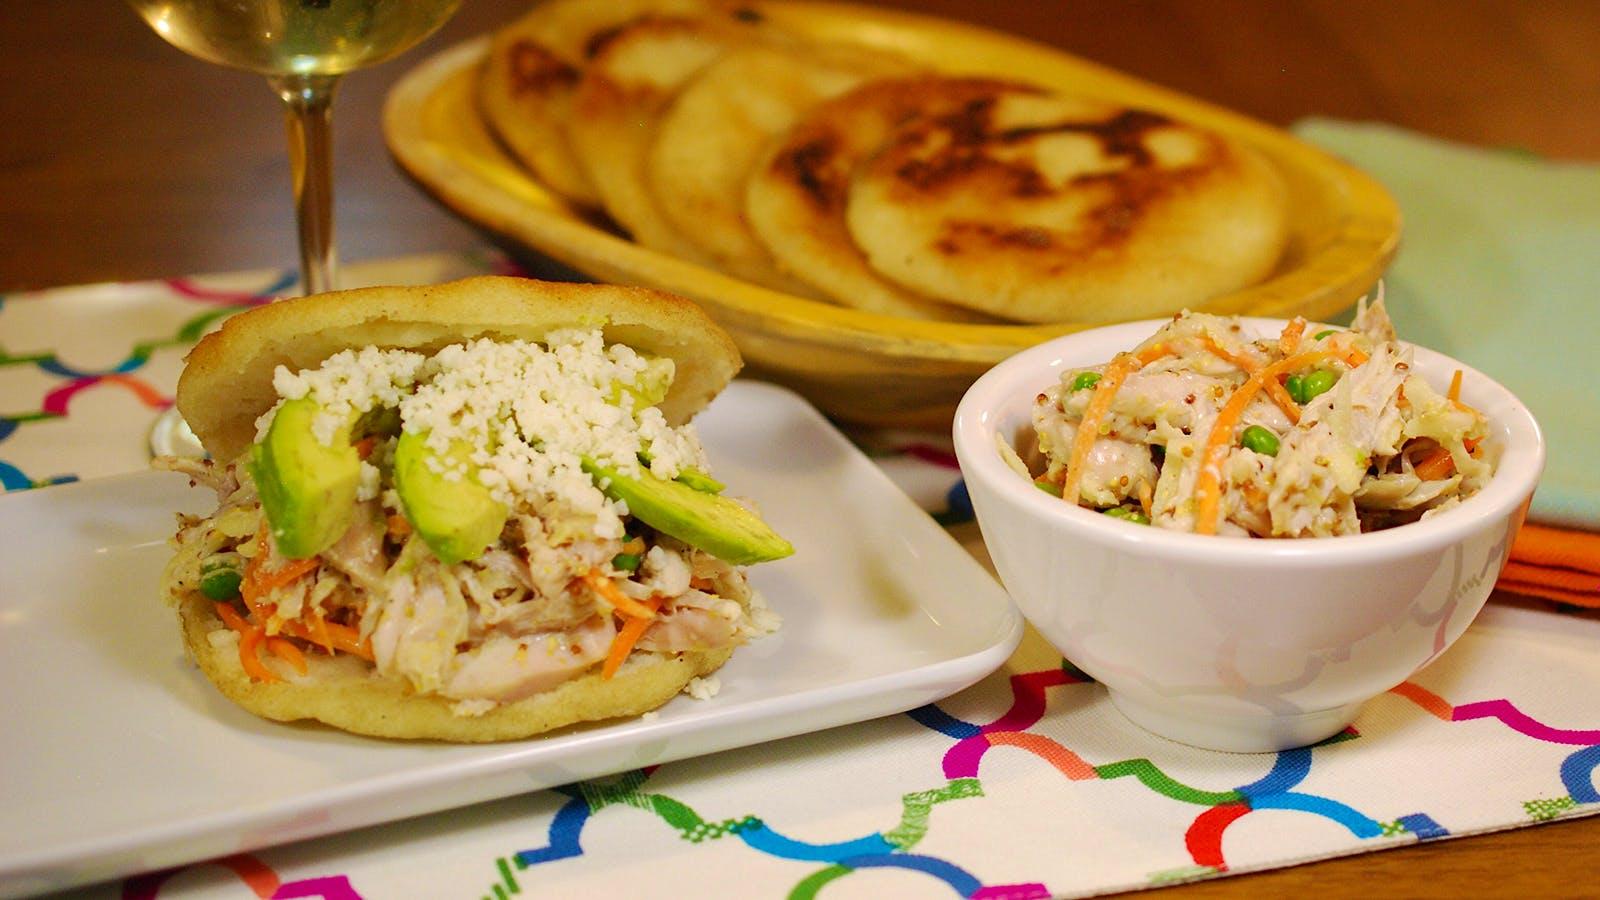 8 & $20: Arepas with Venezuelan Chicken Salad